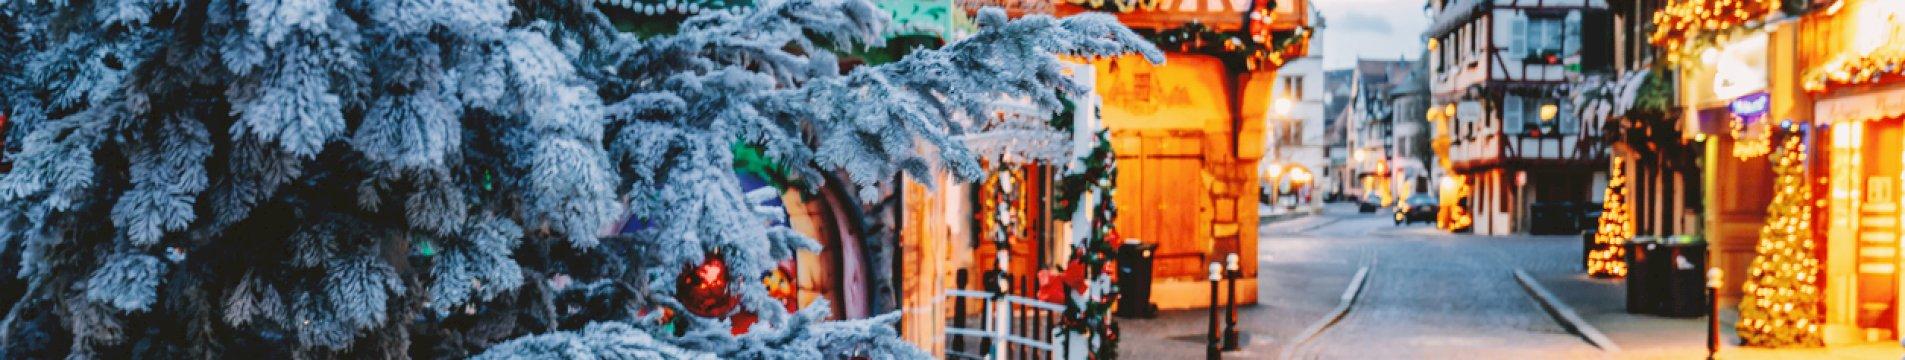 Christmas Market - Festive Season activity ideas for Hen Party